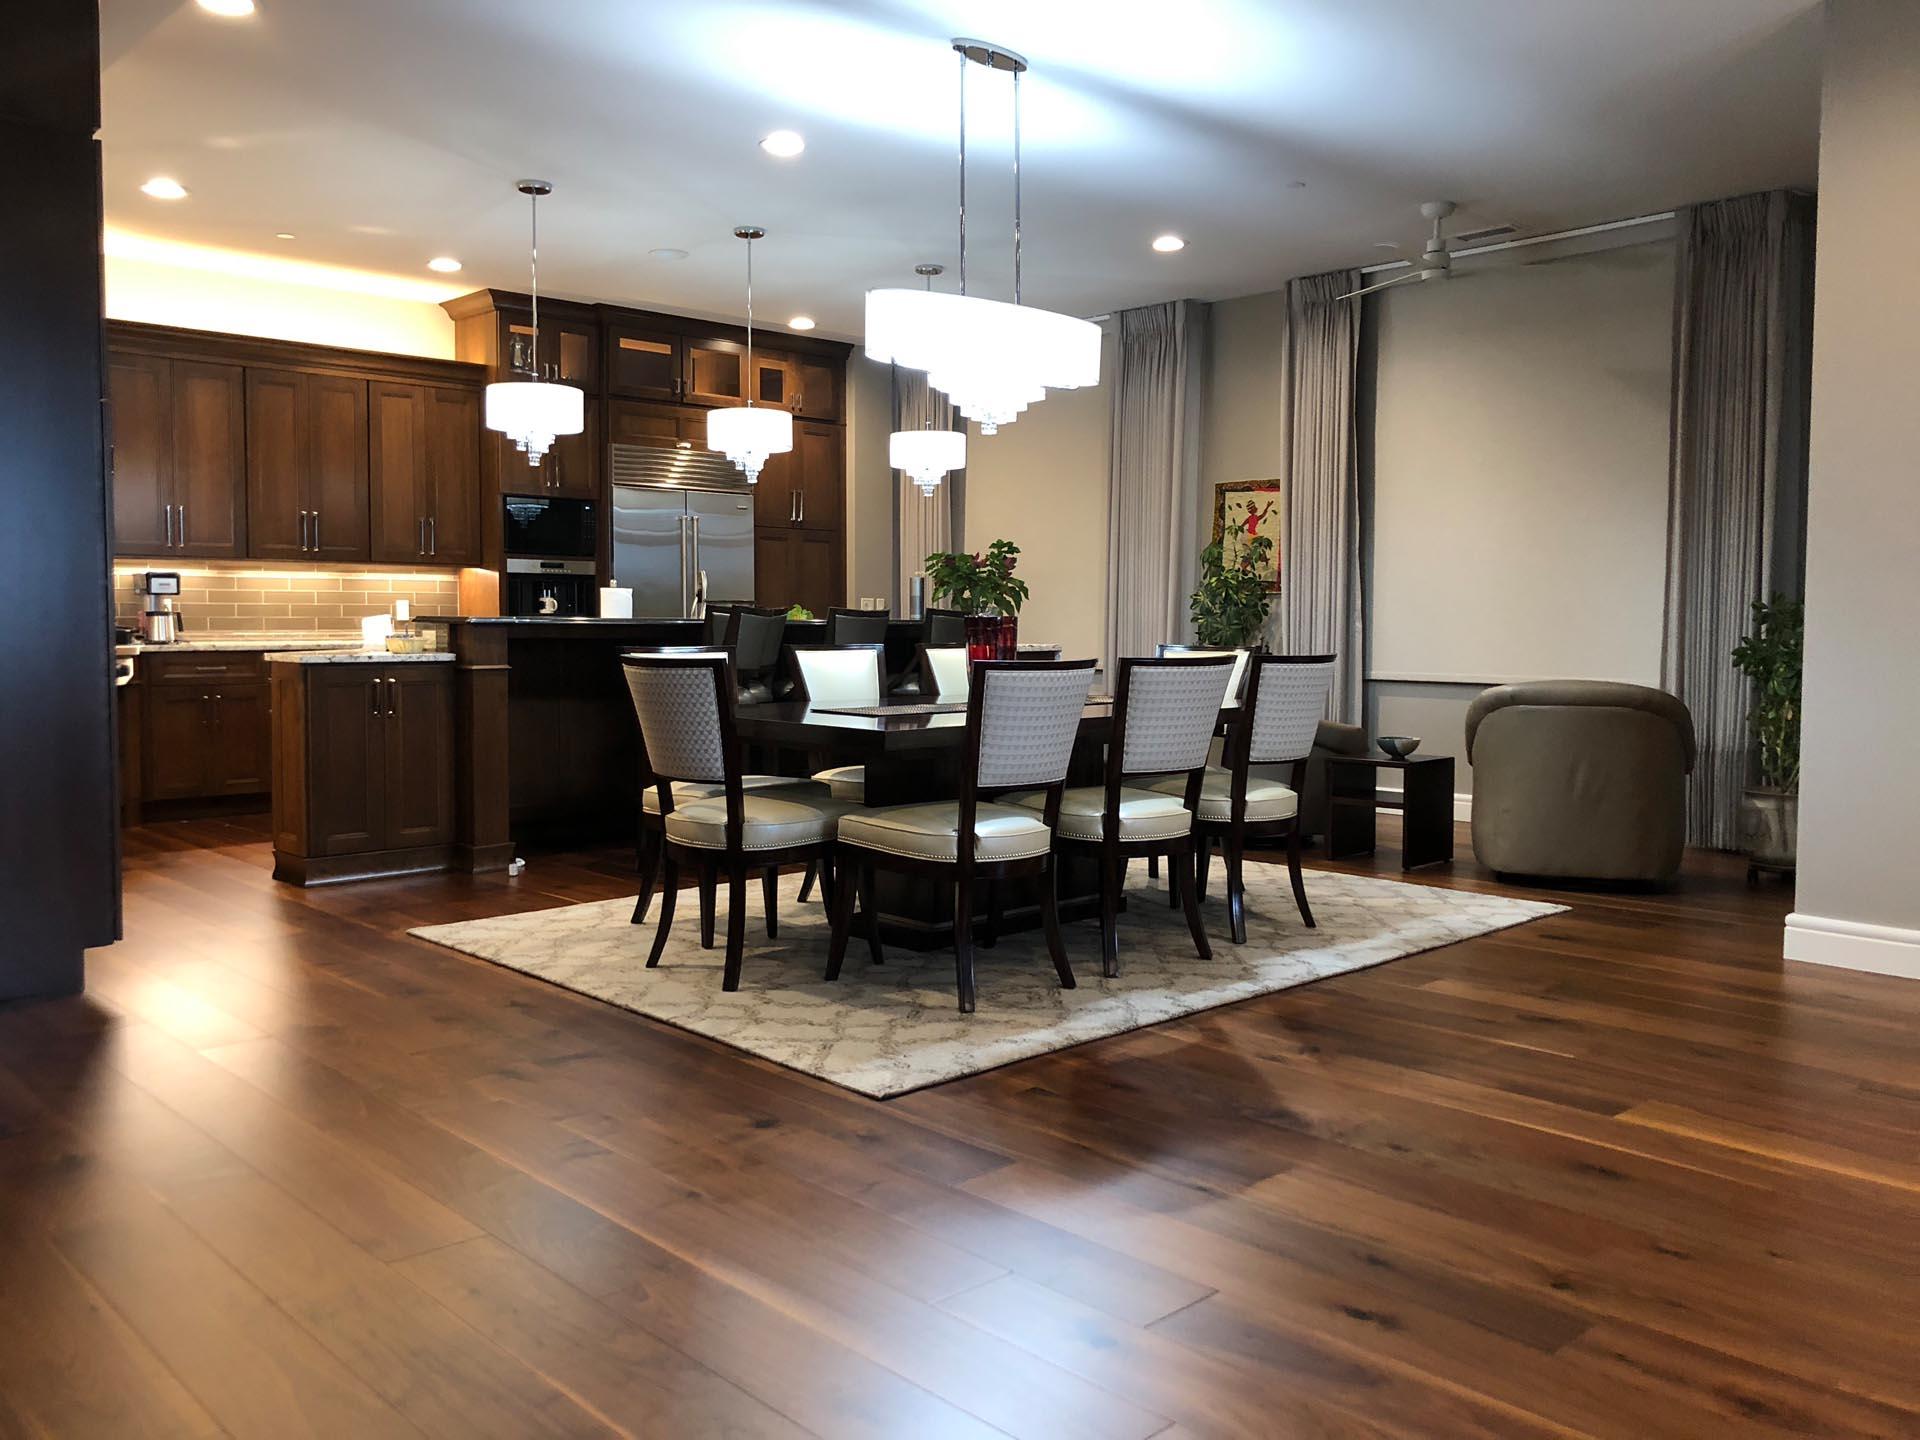 Apartment Design | H Residence | Midland, MI